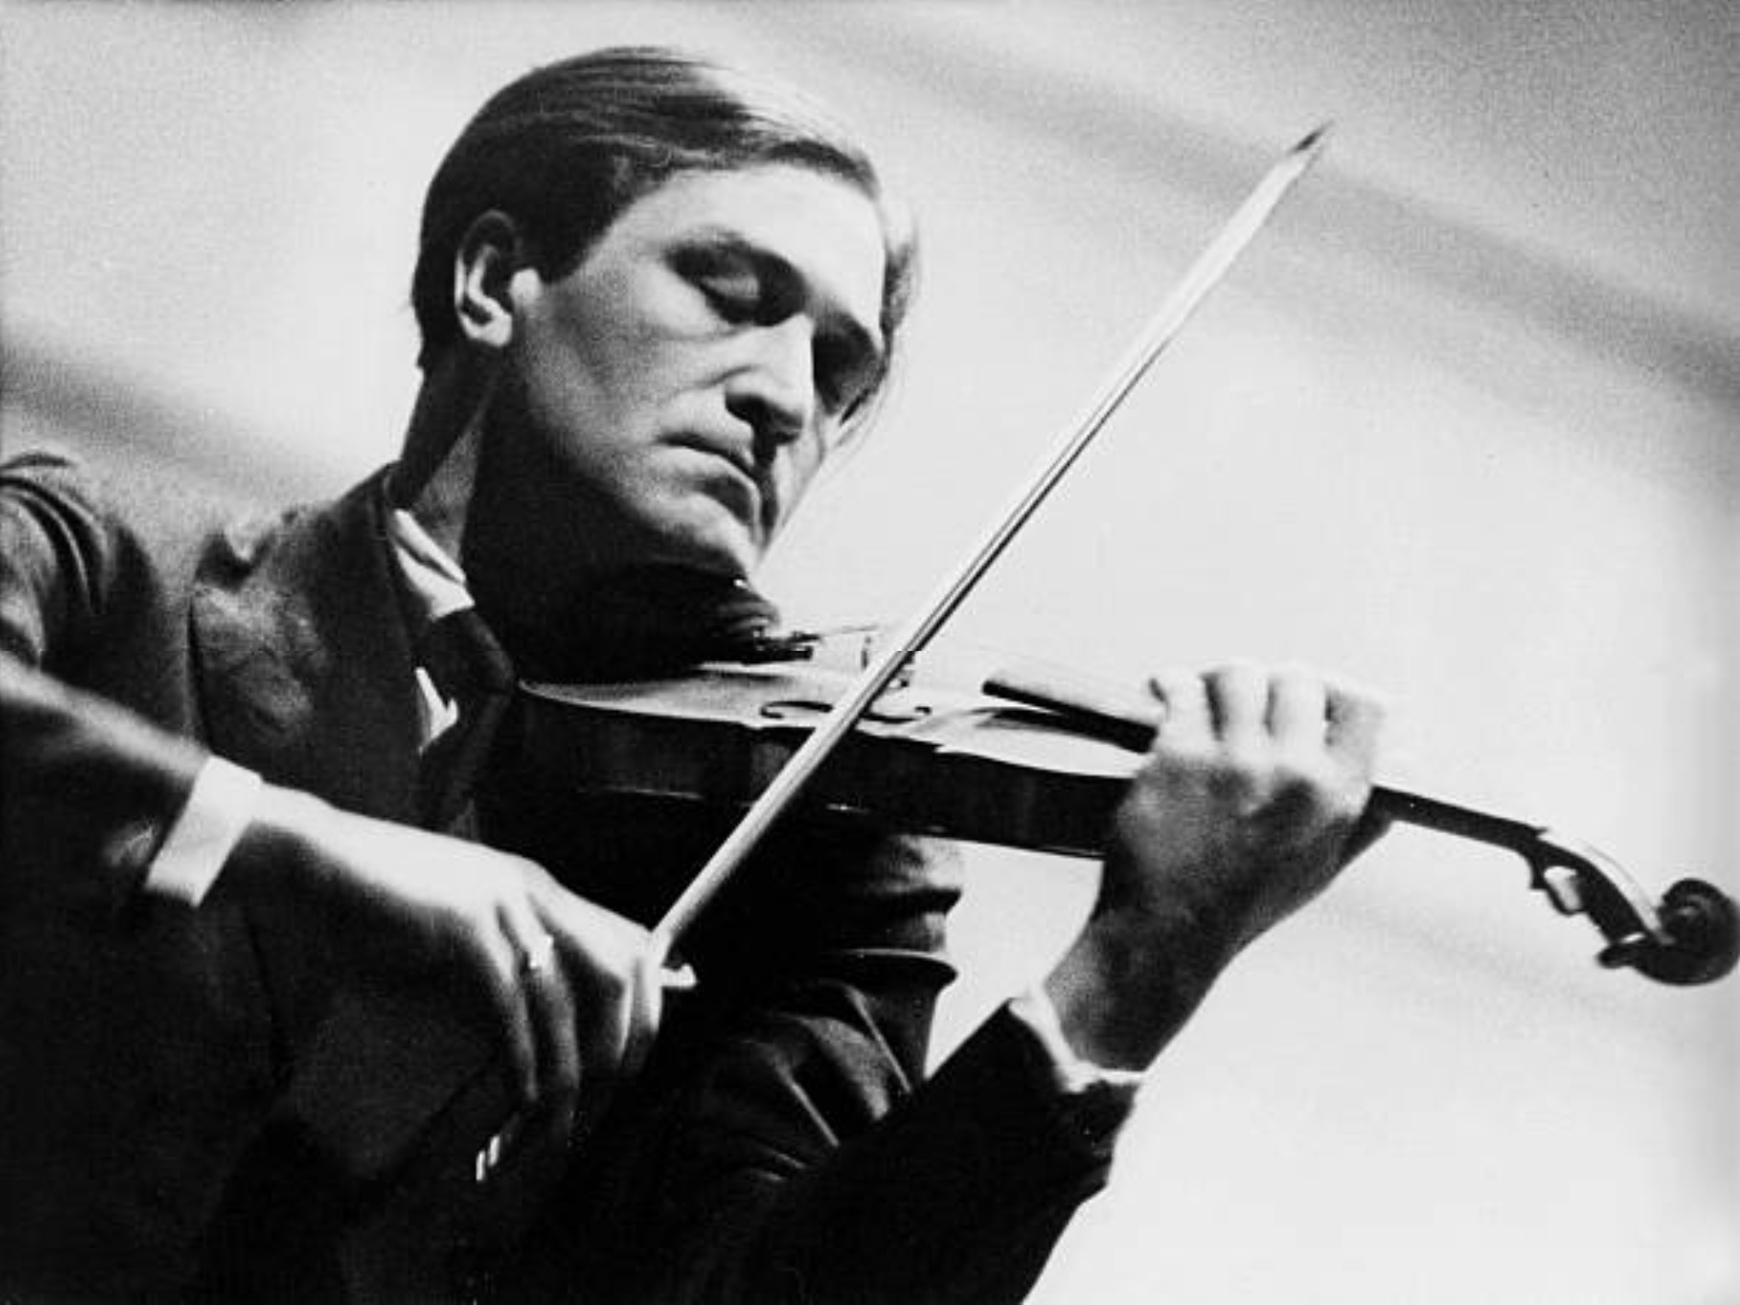 Gerhard TASCHNER en 1955, lieu et photographe inconnus